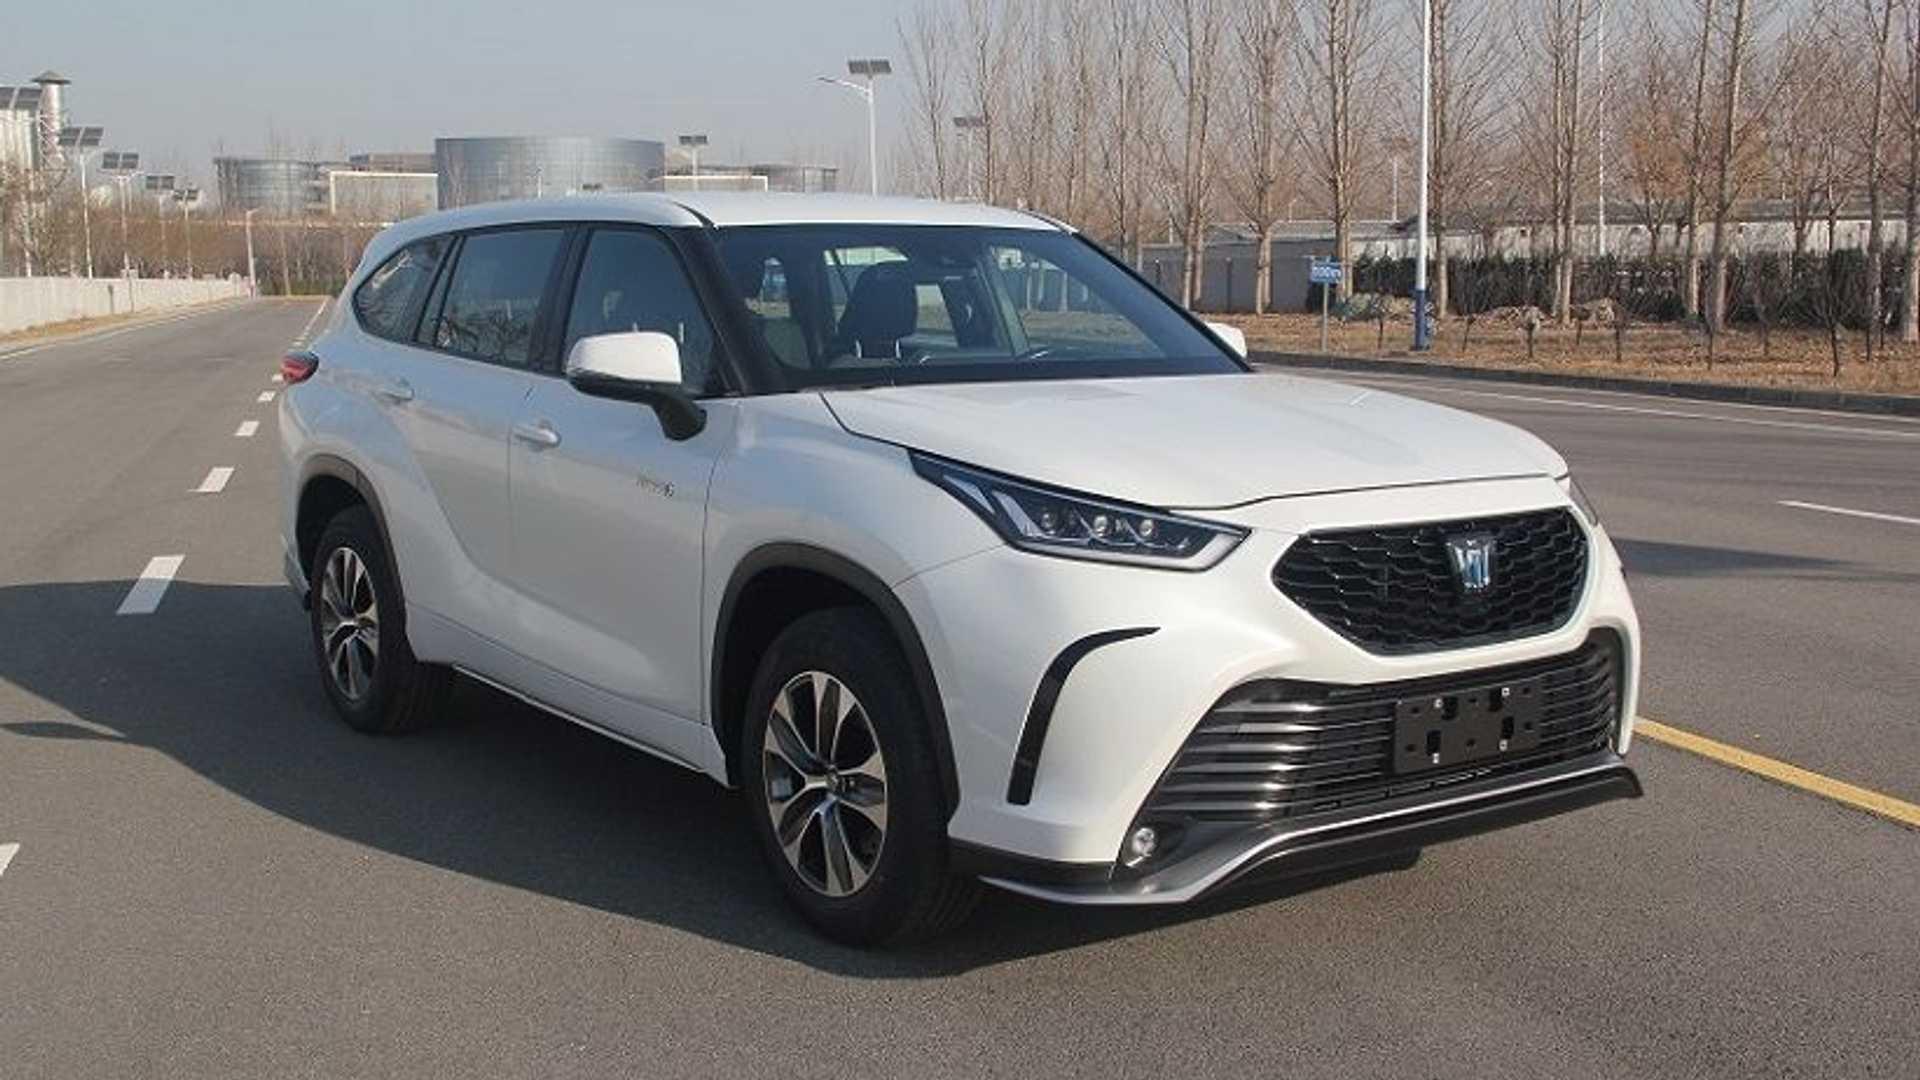 Toyota-Crown-Kugler-SUV-3